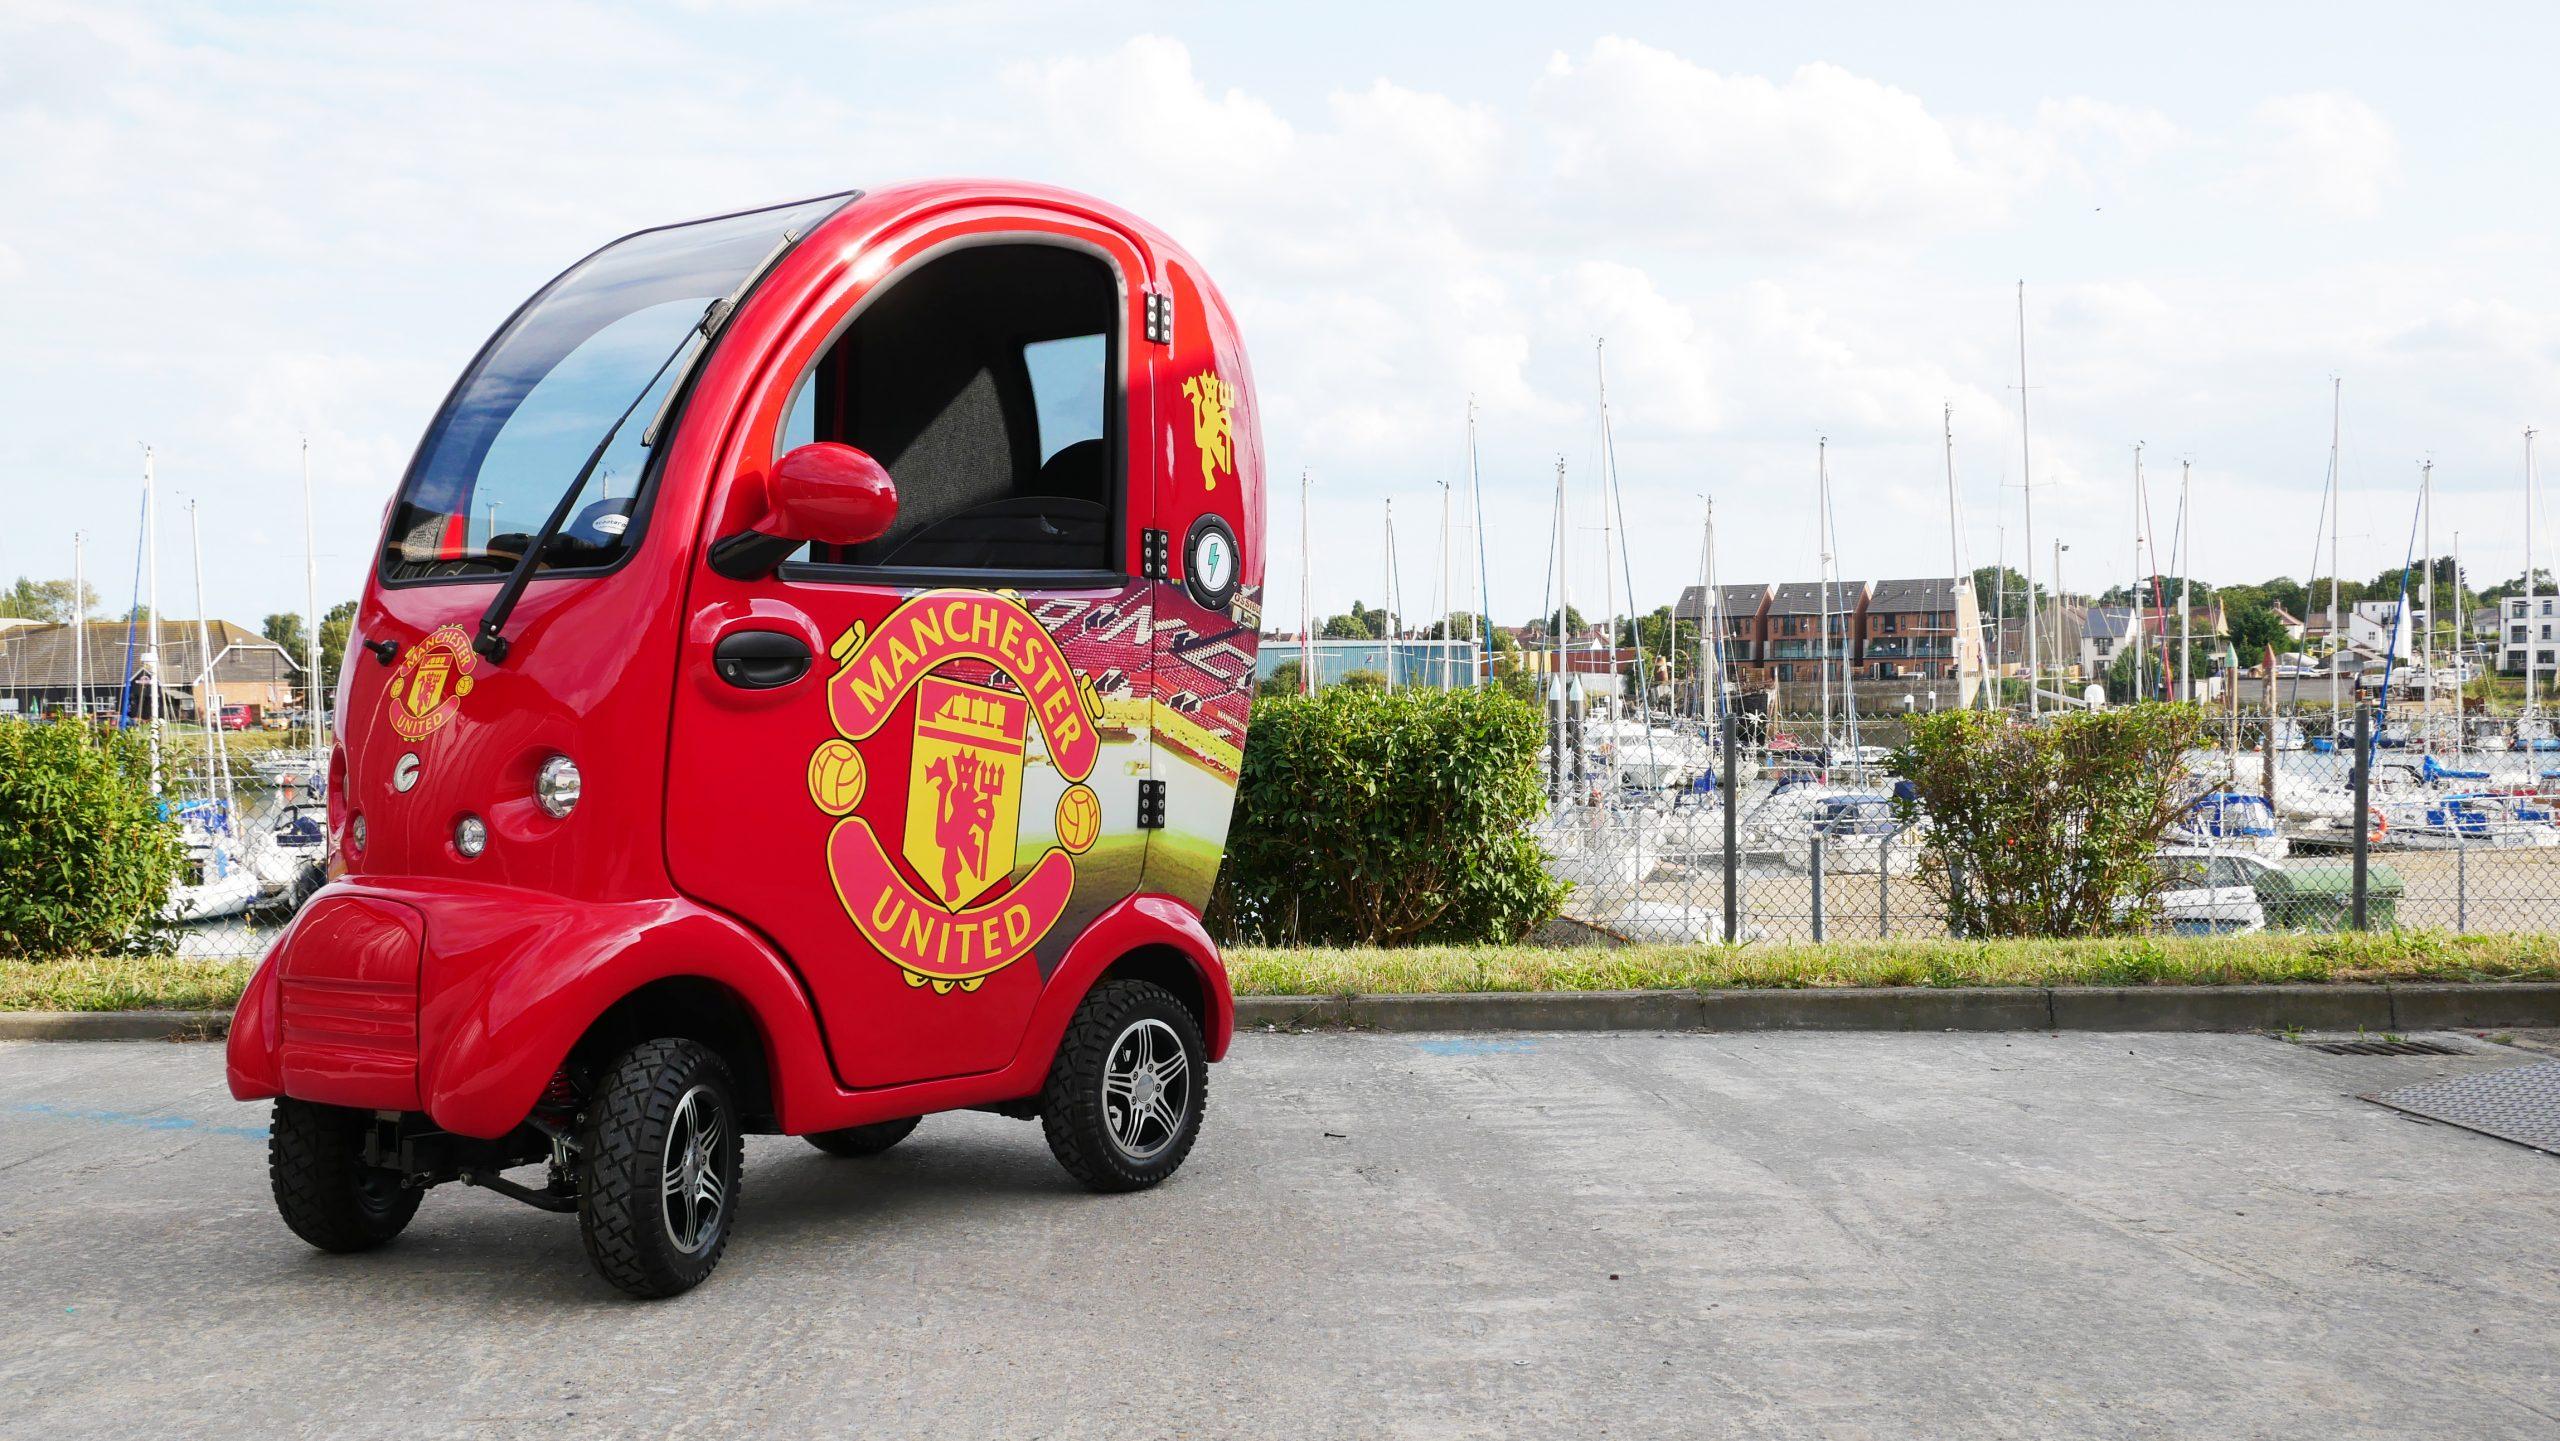 Manchester United Cabin Car